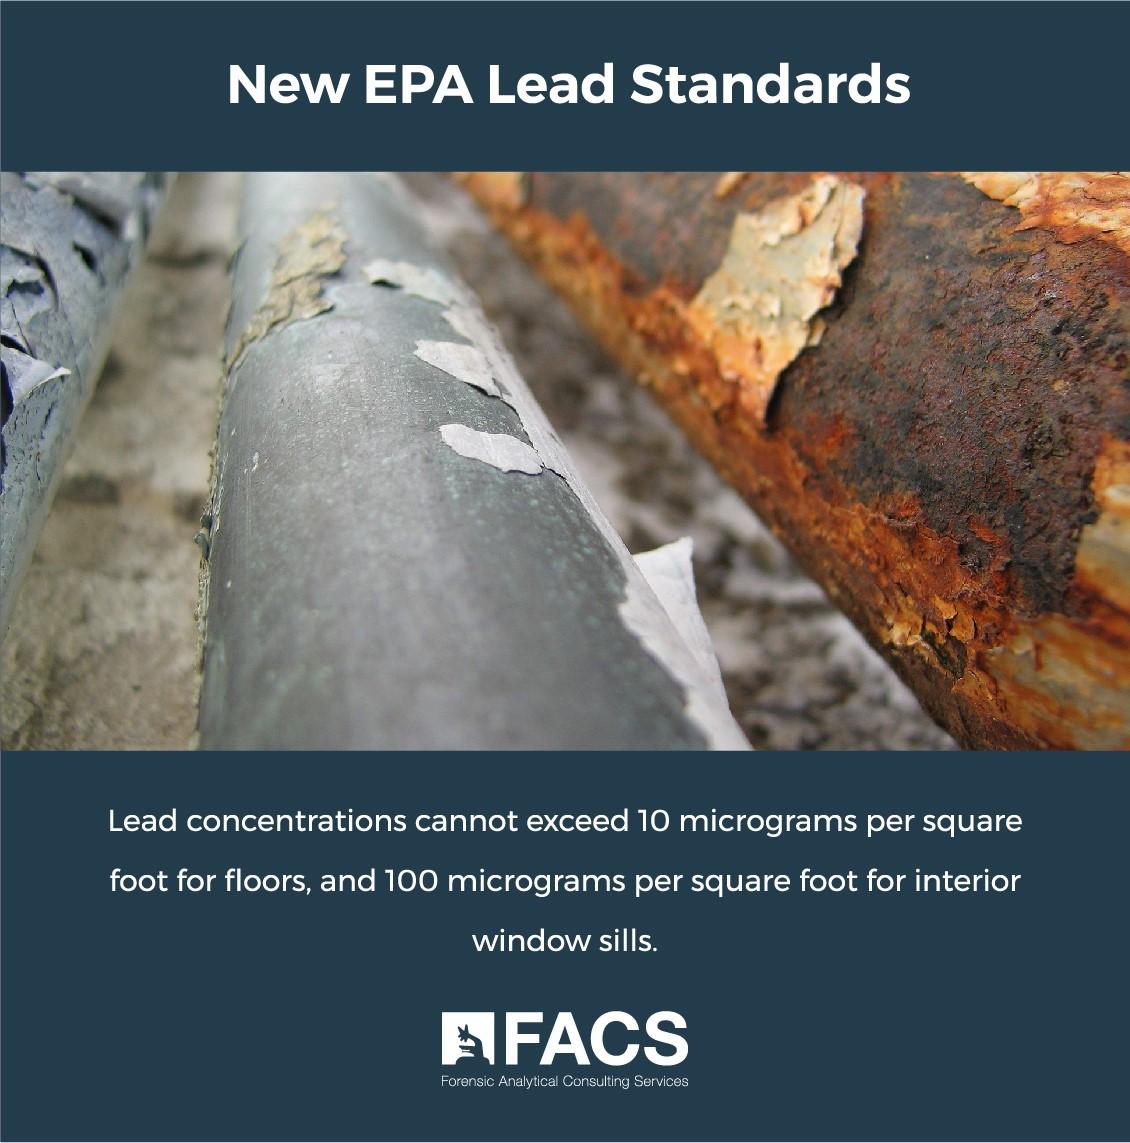 New EPA Lead Standards